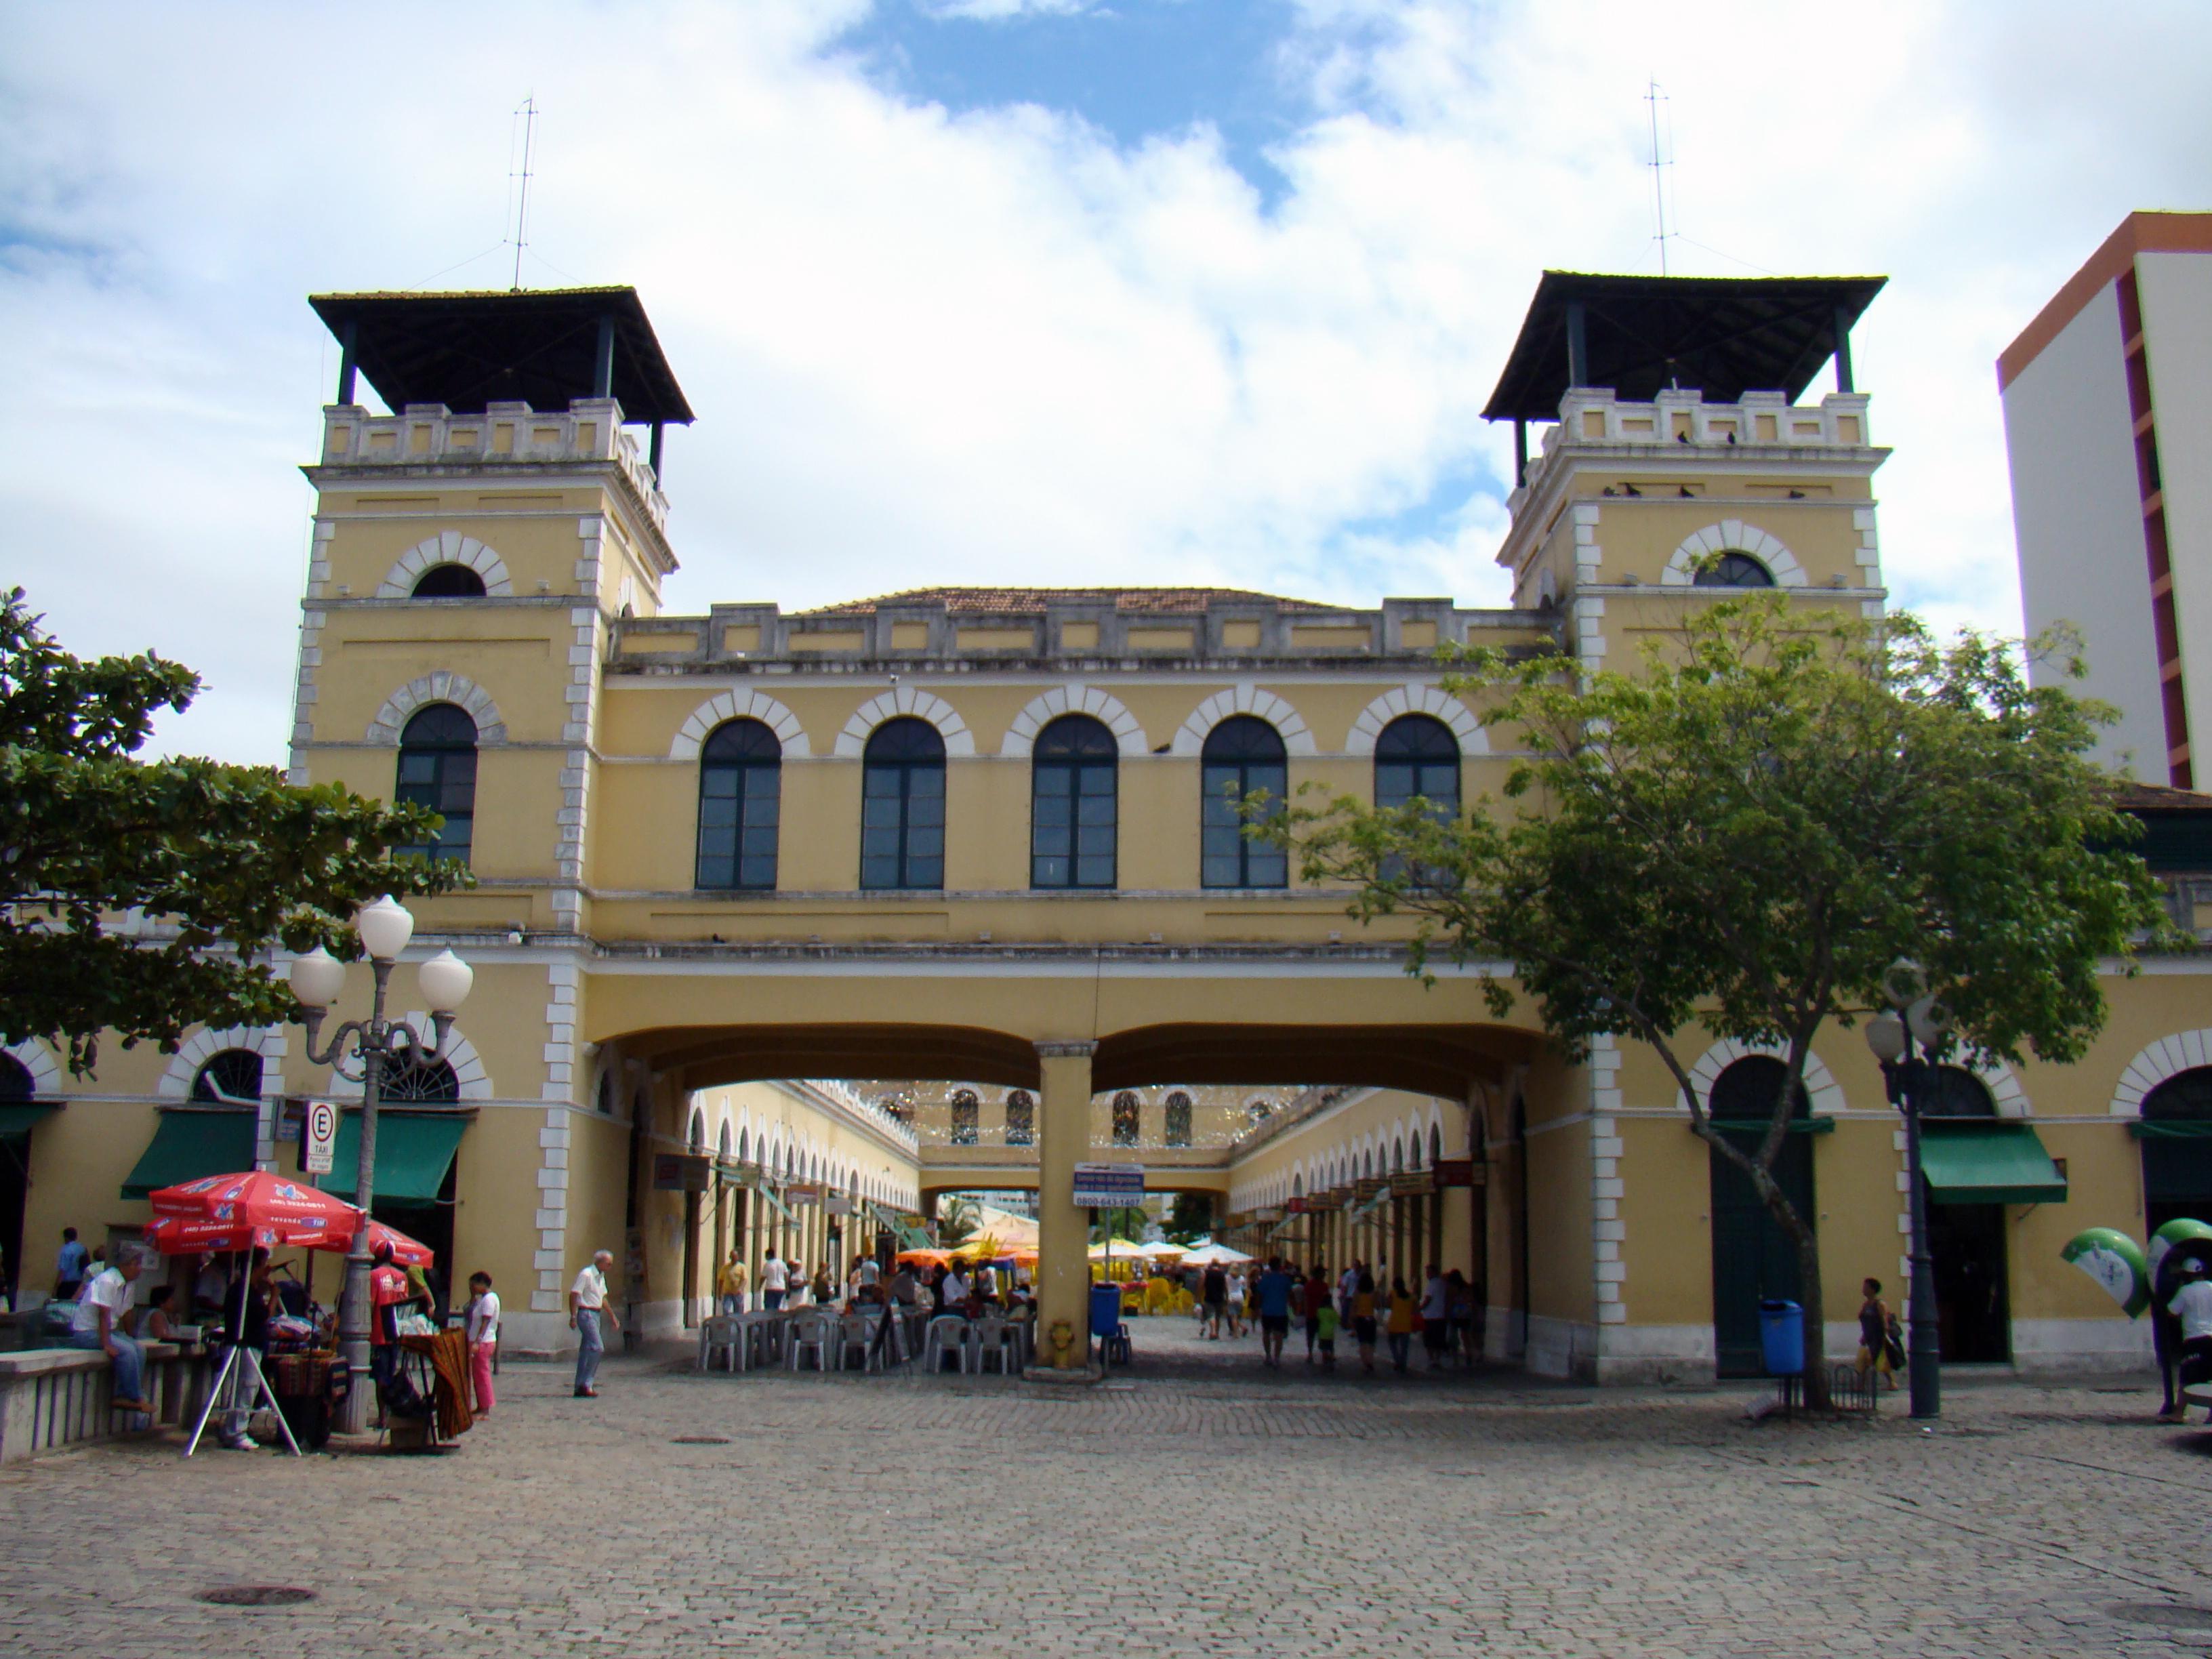 mercado publico de florianopolis, santa catarina